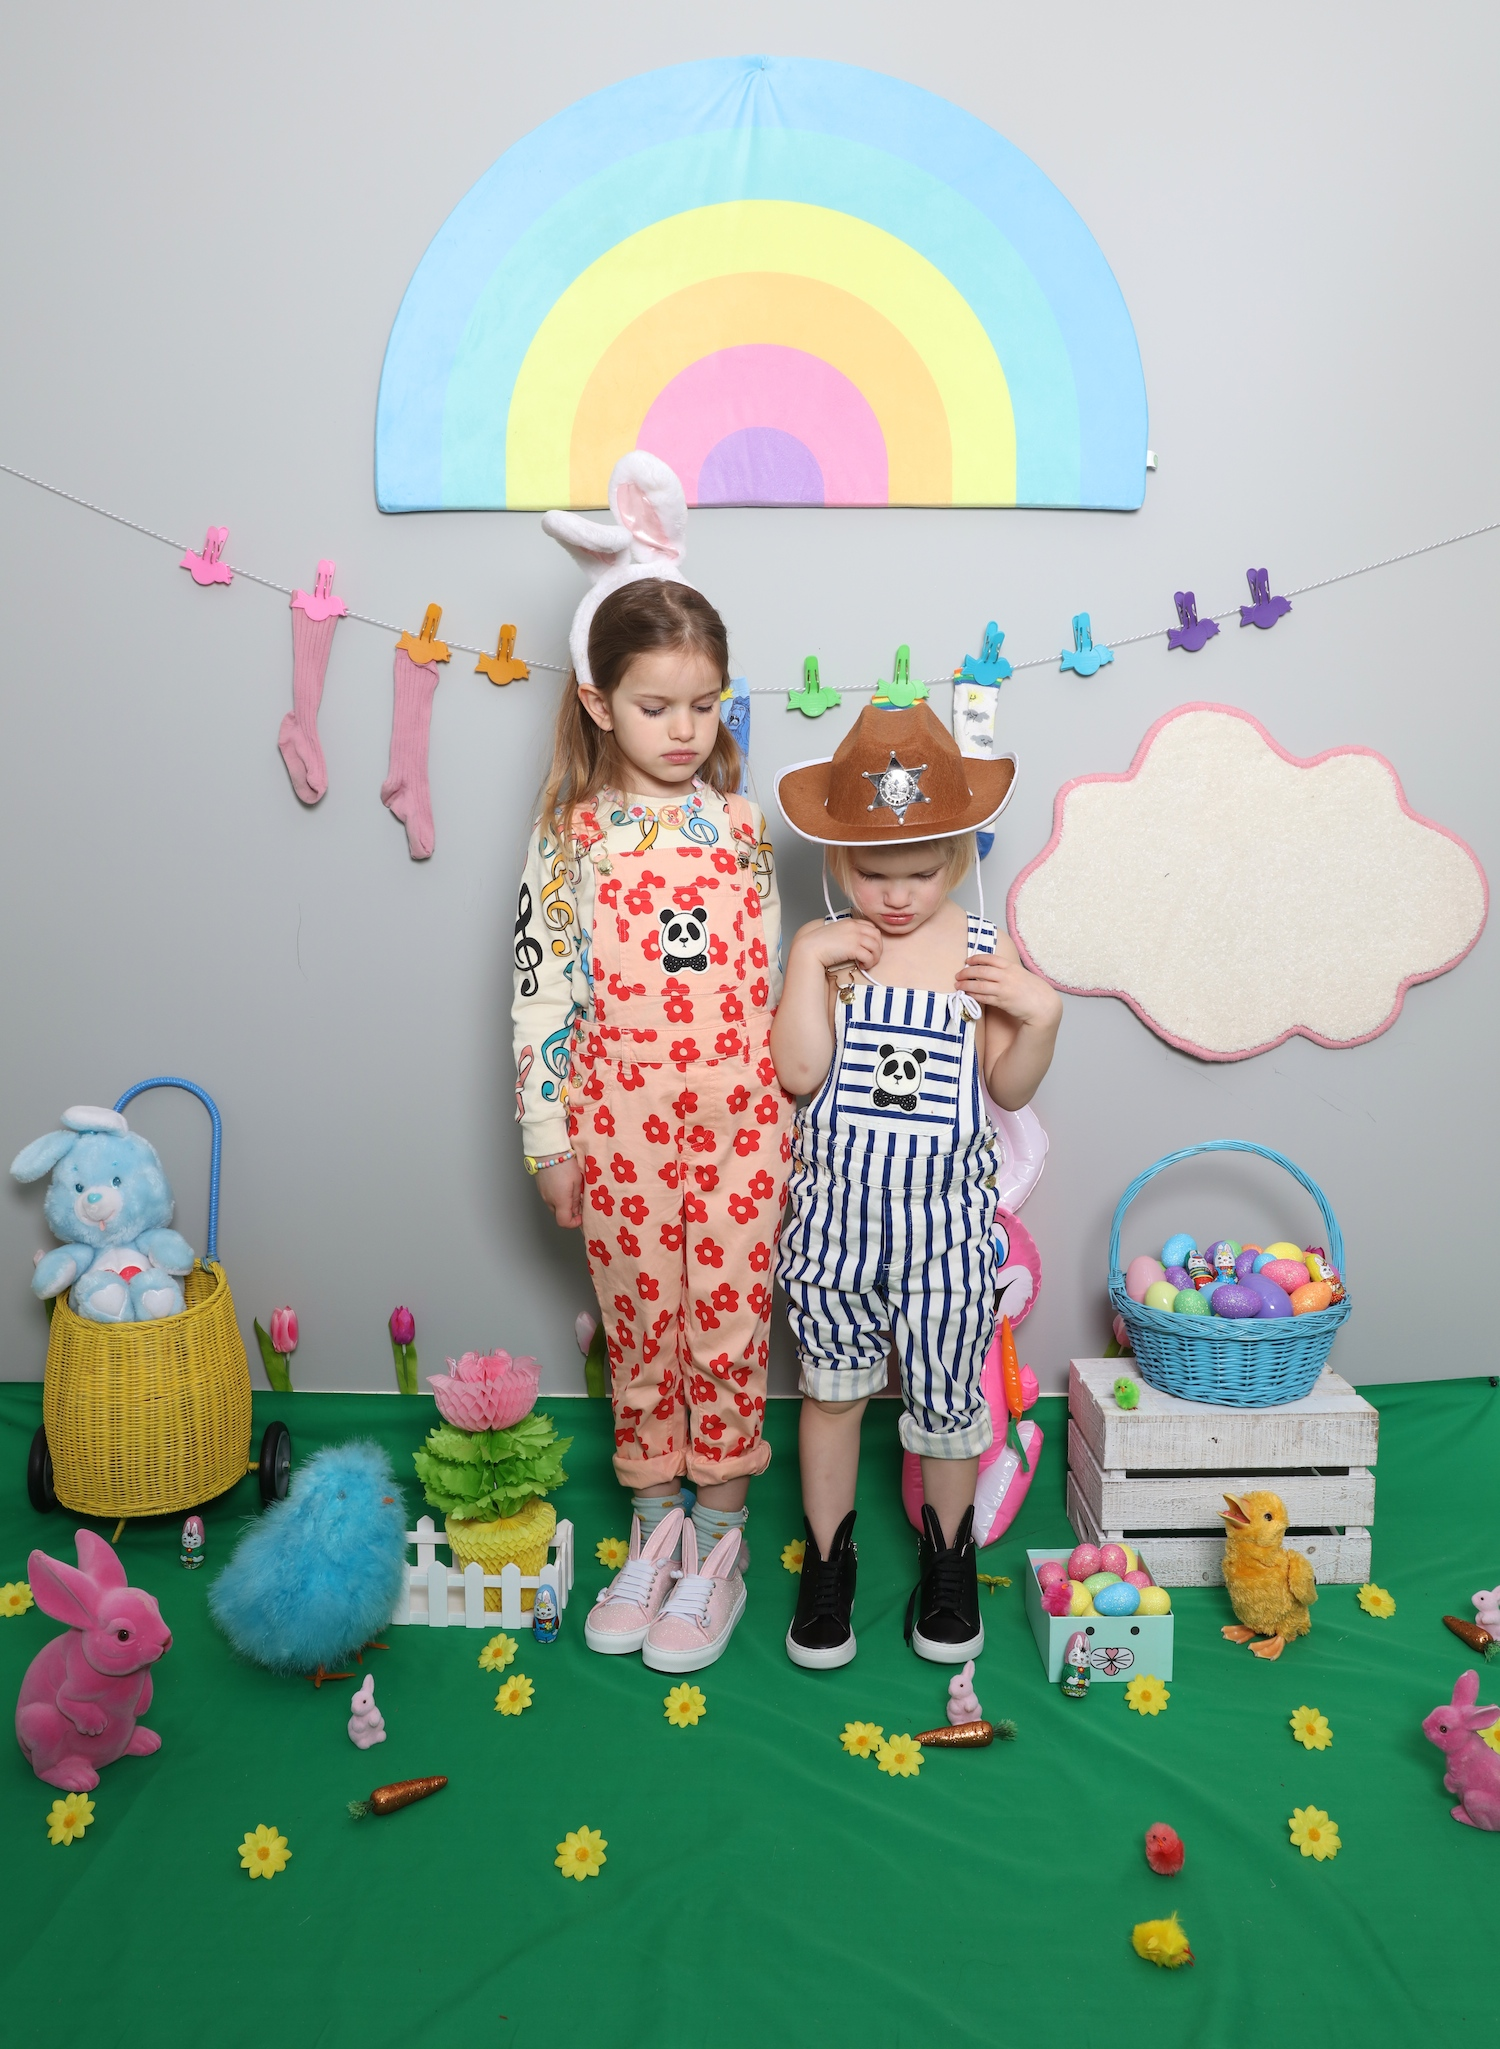 minna_parikka_children_salon_mini_rodini_dungarees_bunny_easter